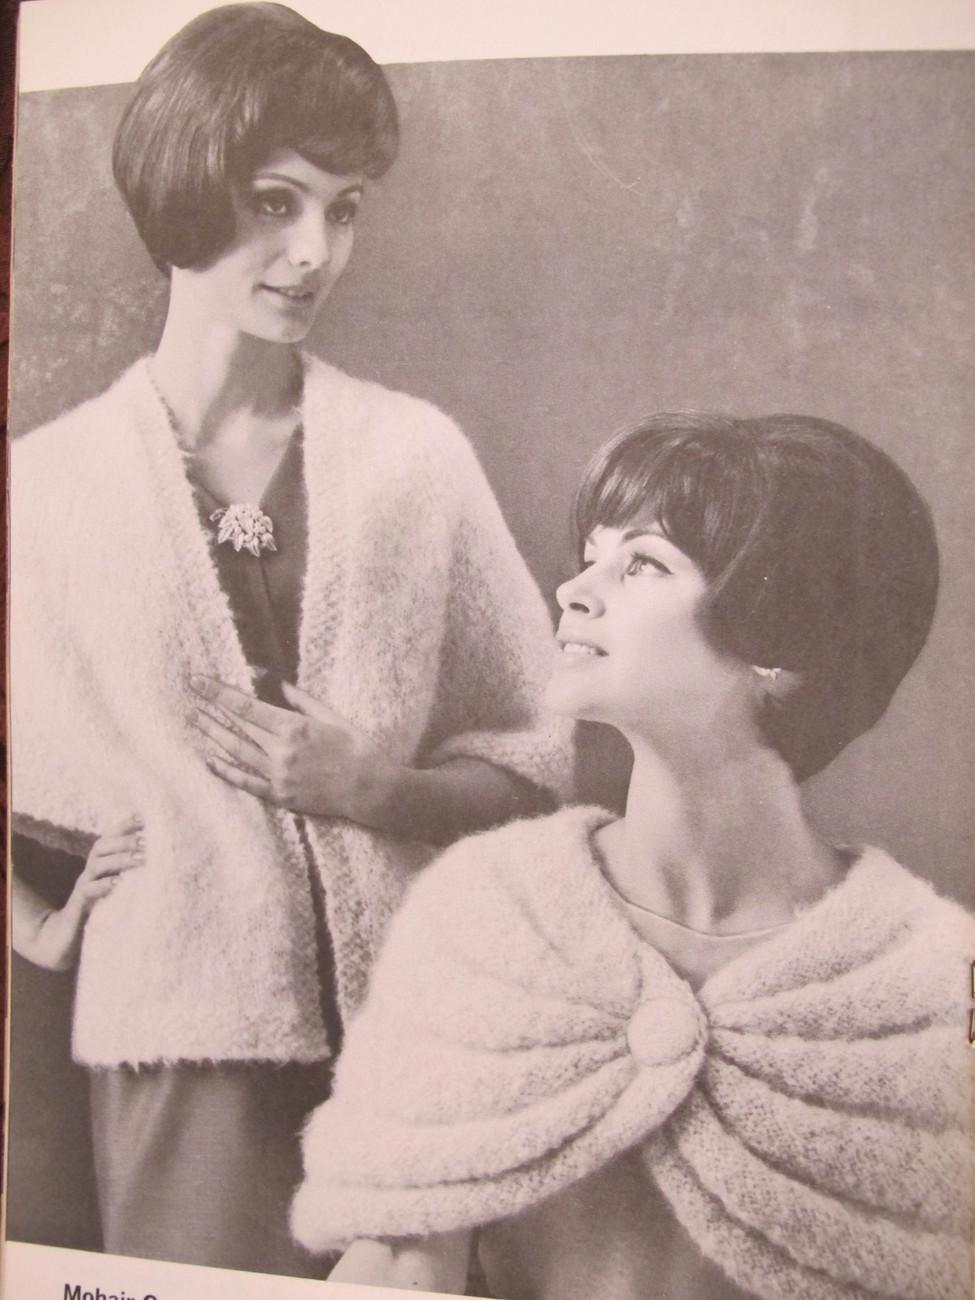 Vintage Patons Knitting Crochet Crocheting Patterns Hats Scarves Poncho FAMILY